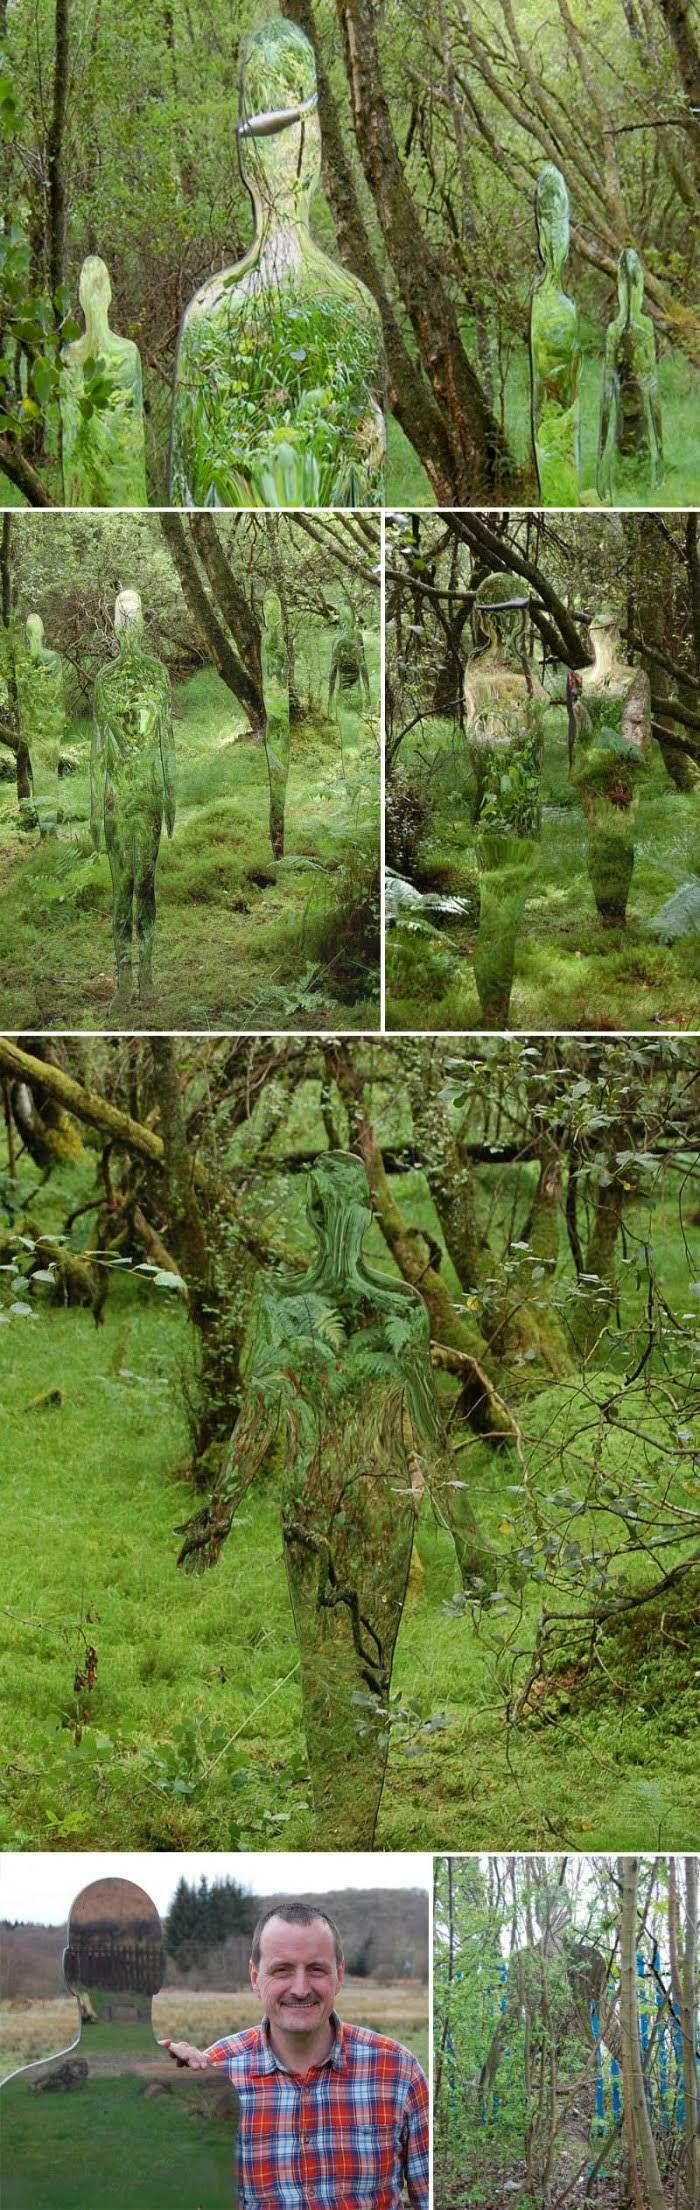 cool art installation in woodland walk at the David Marshall Lodge, Scotland, mirrors, predator